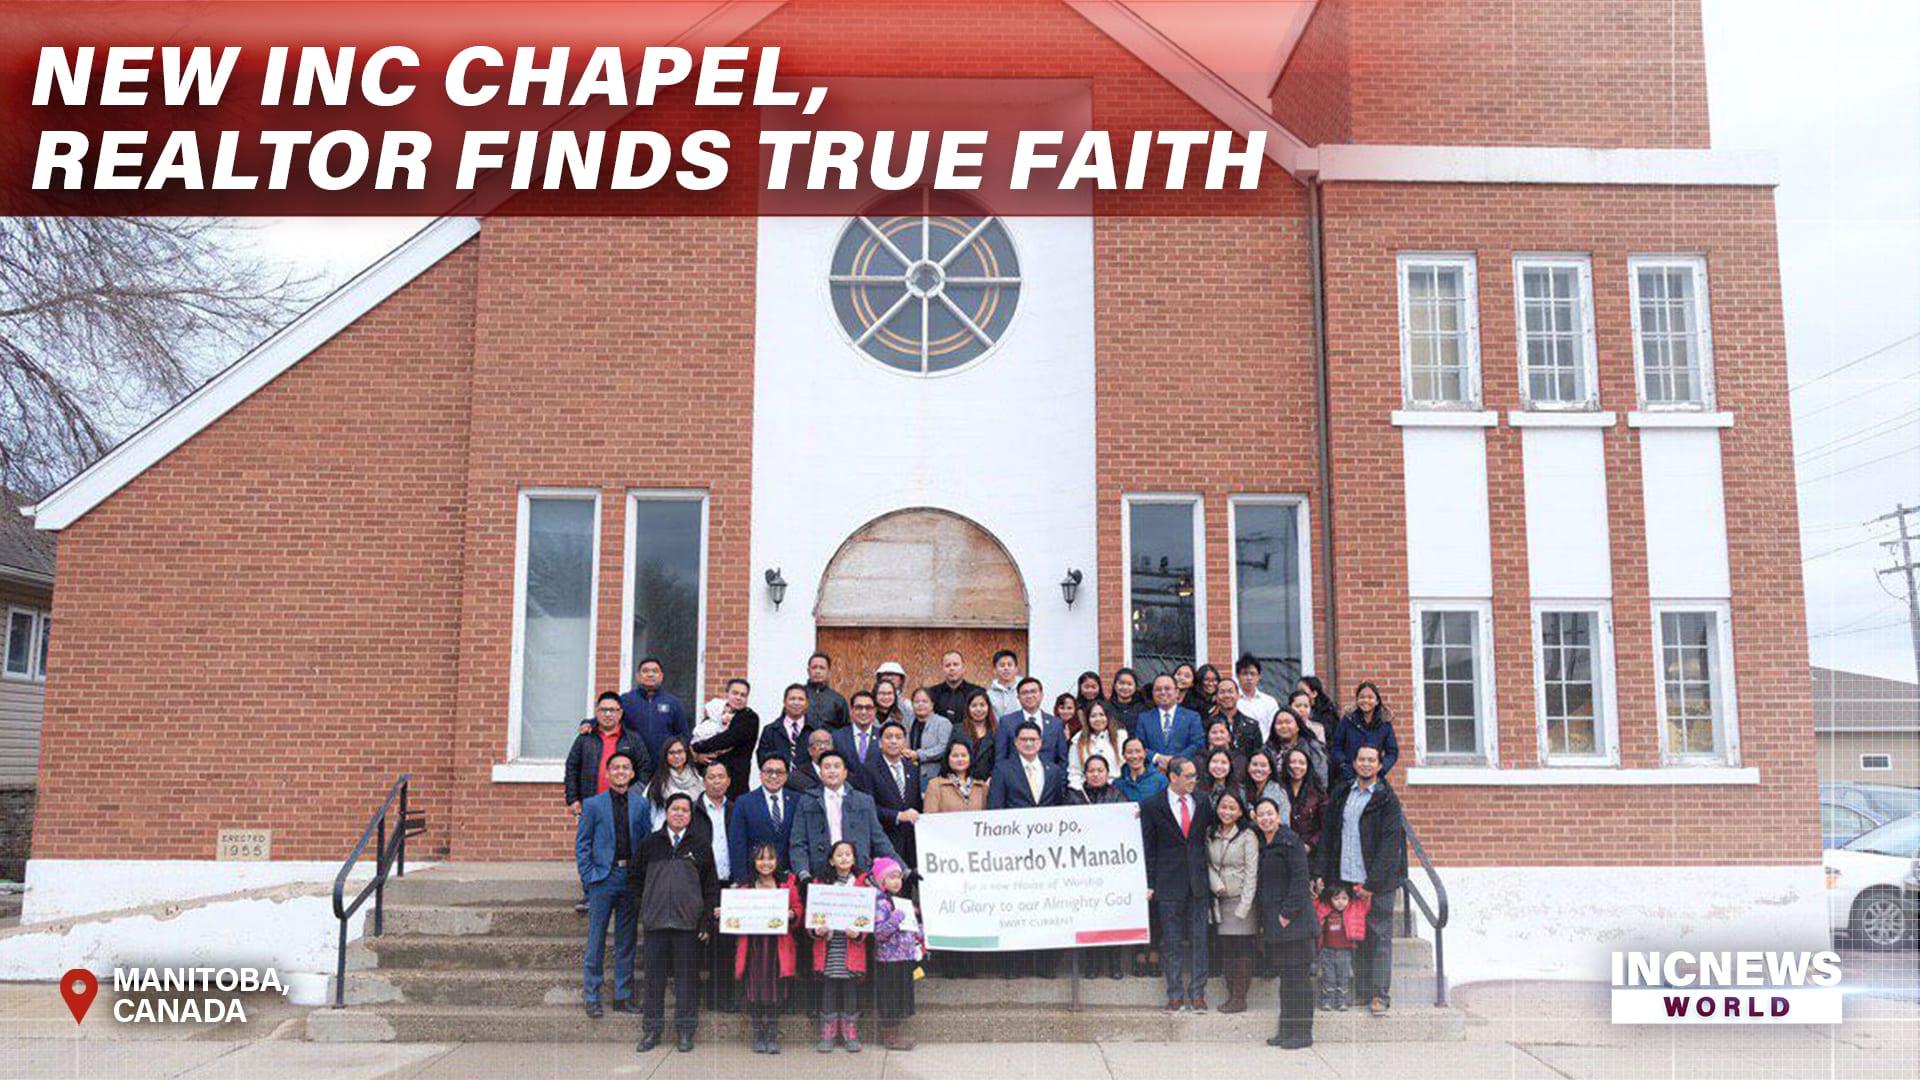 New INC Chapel, Realtor Finds True Faith